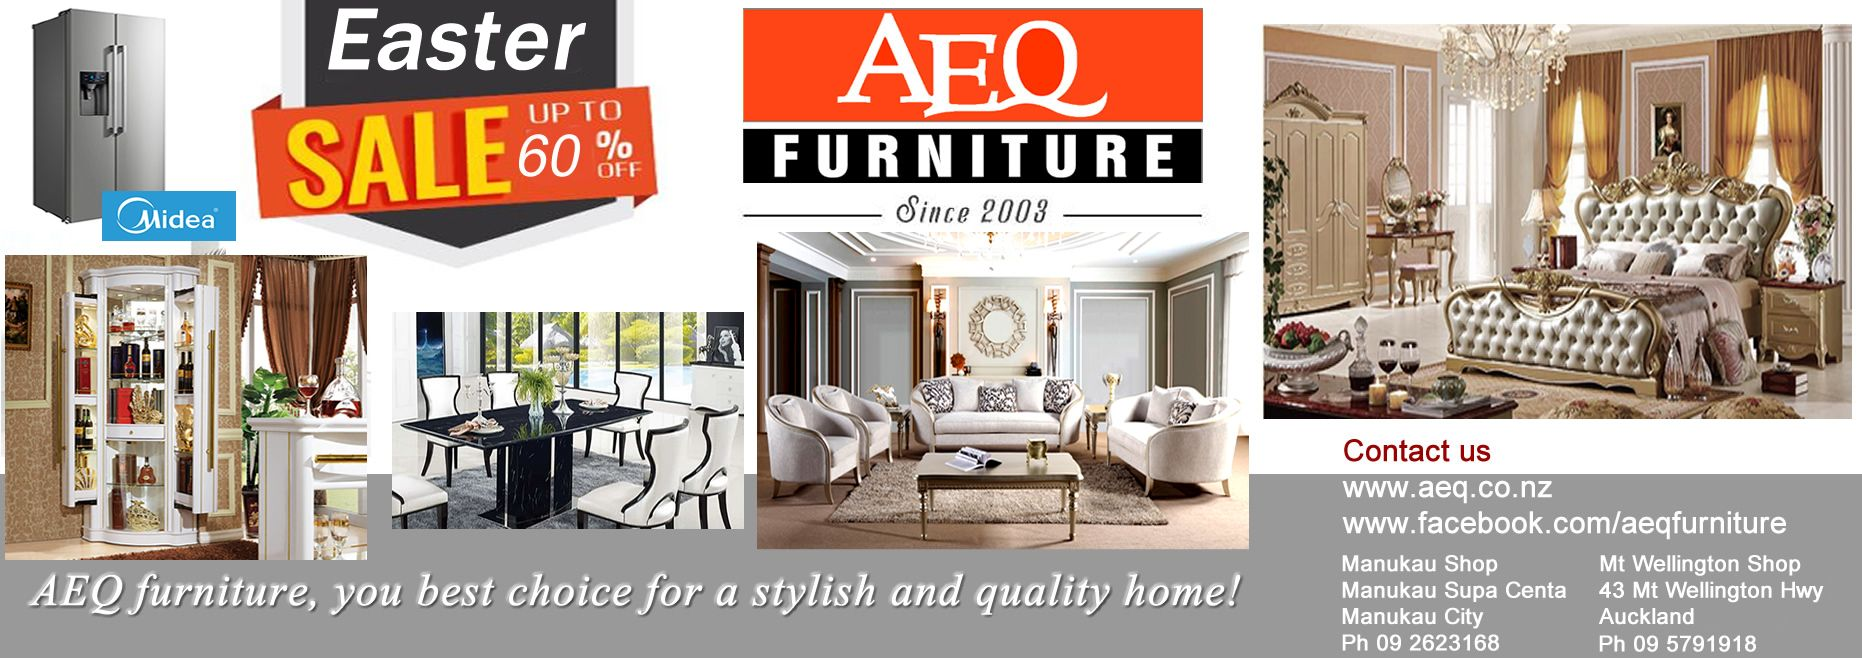 AEQ Furniture (26/03/21 - 03/04/21)